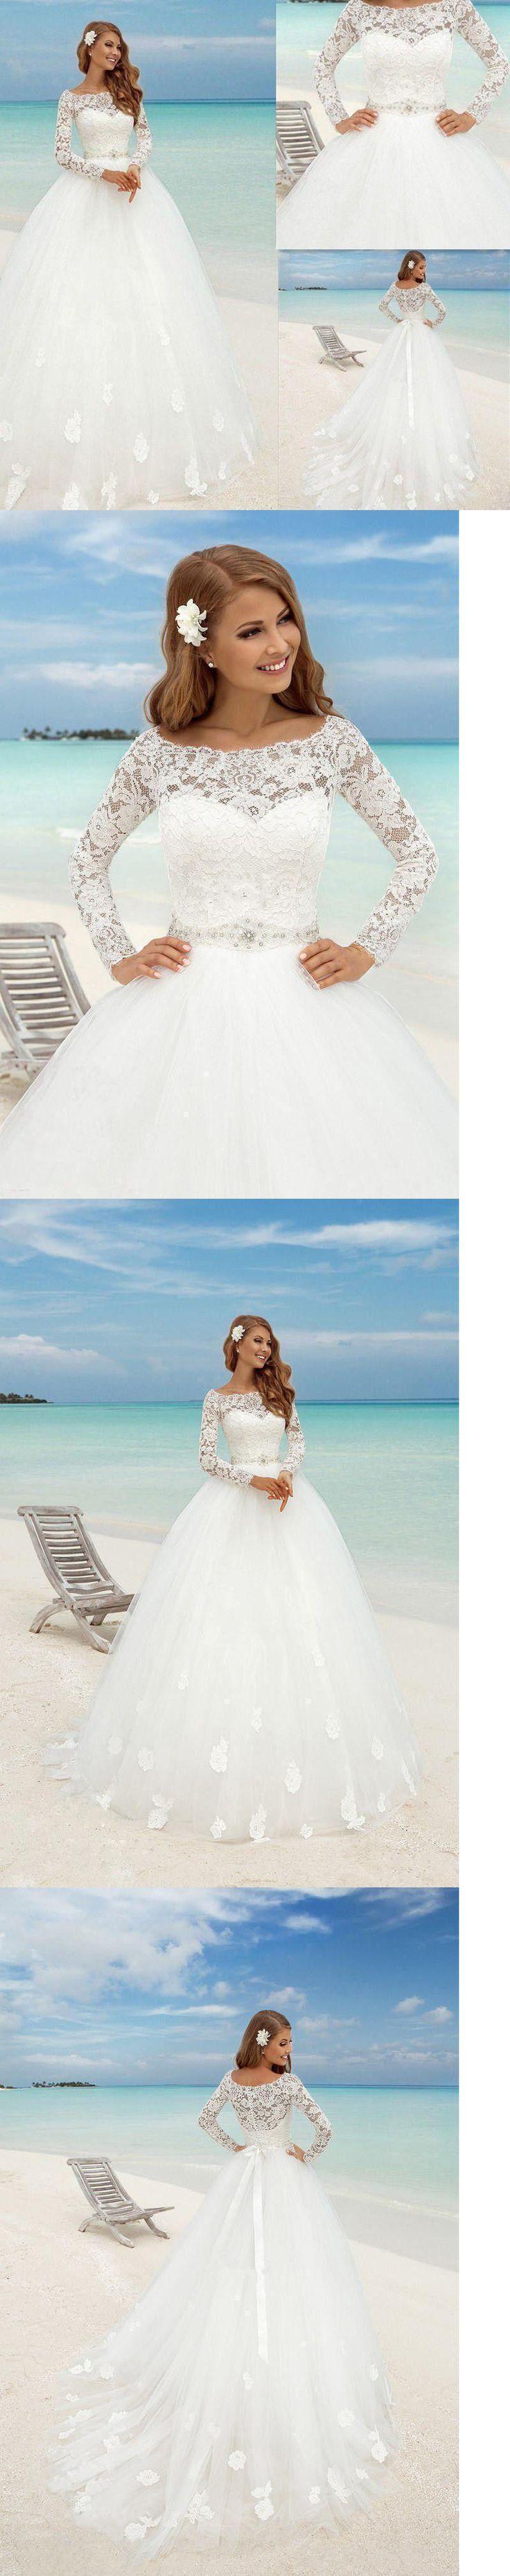 1082 best wedding dresses images on Pinterest | Wedding frocks ...